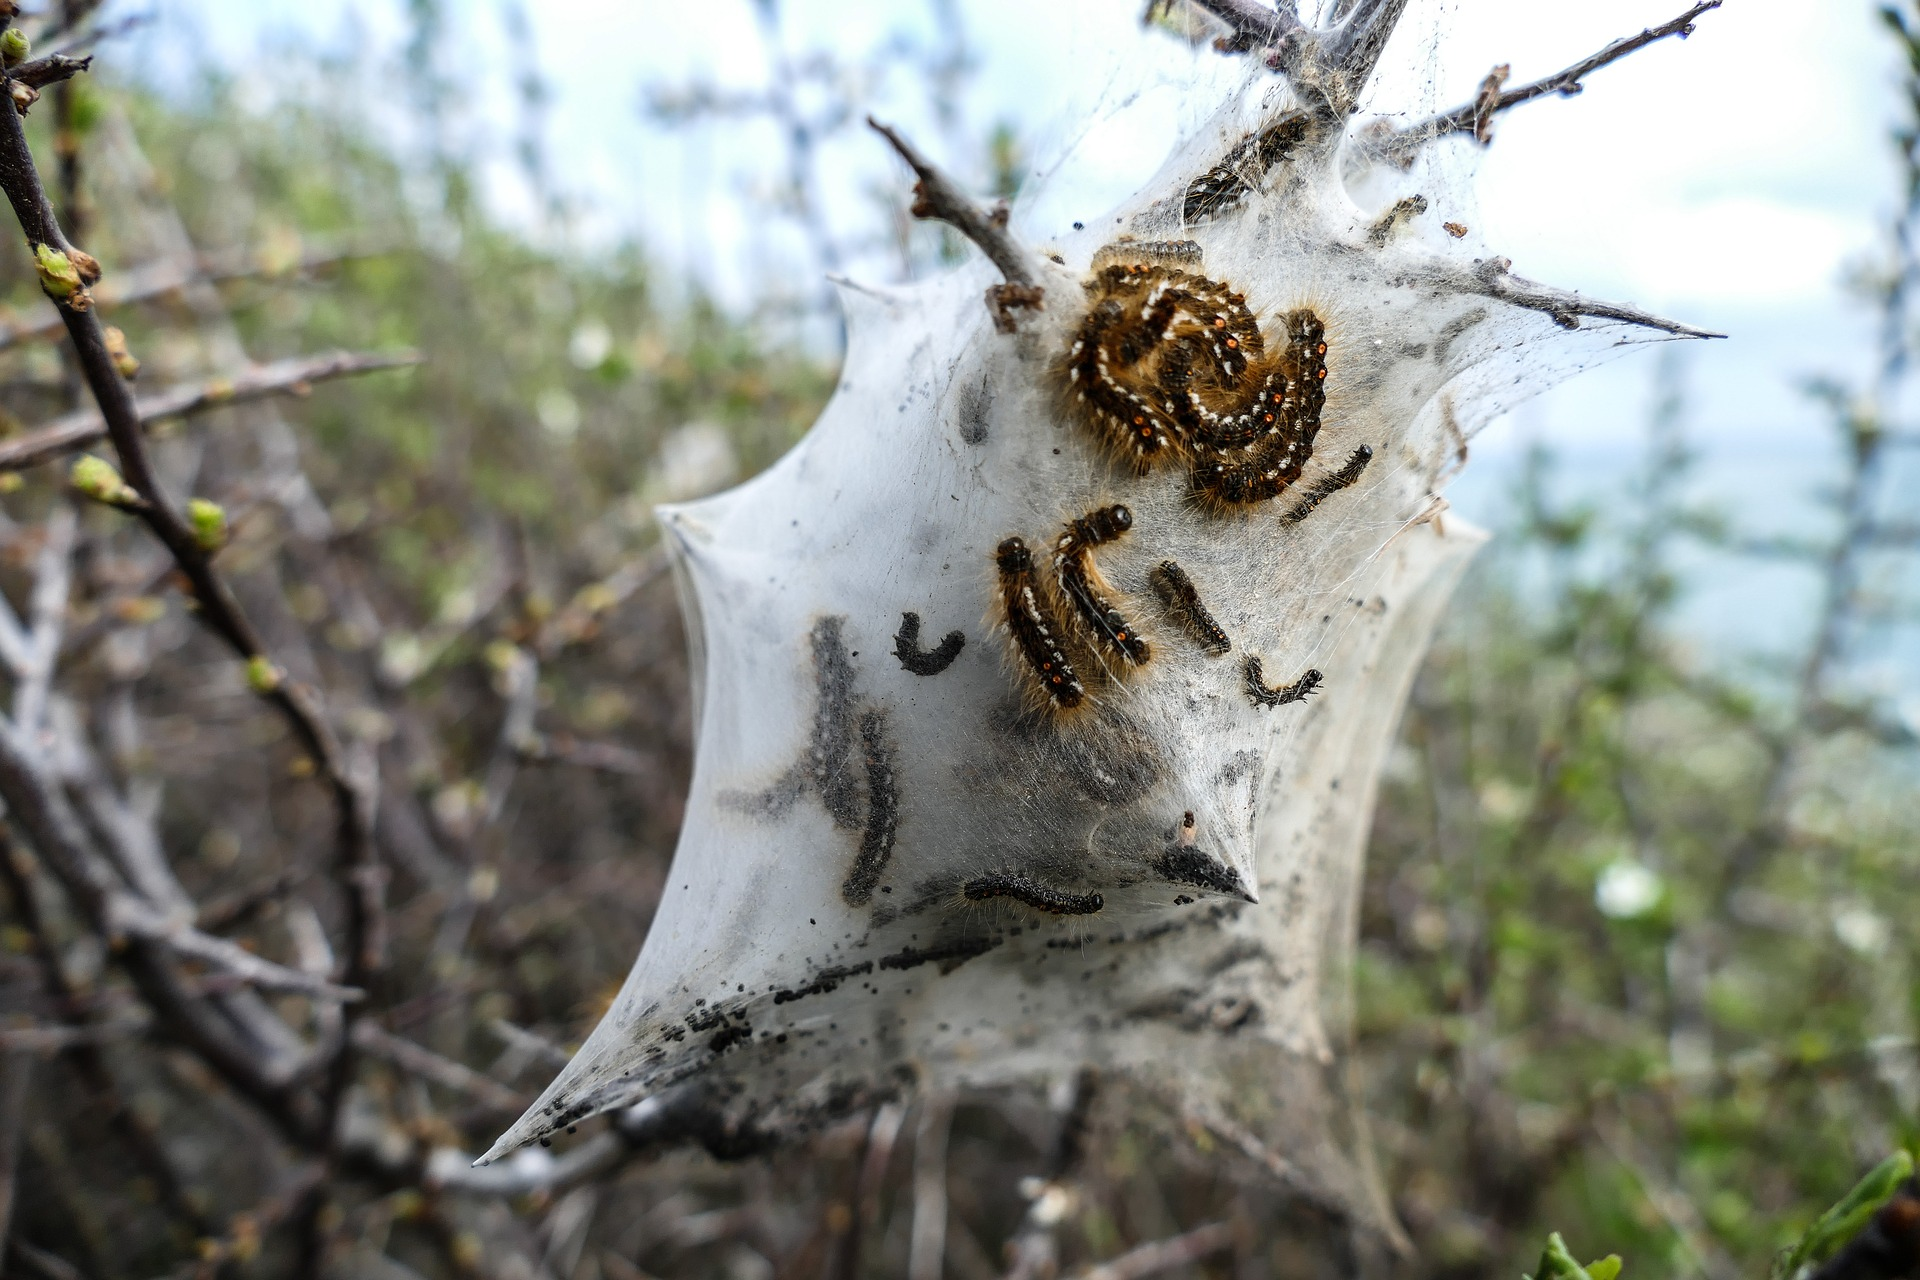 Yponomeuta malinellus